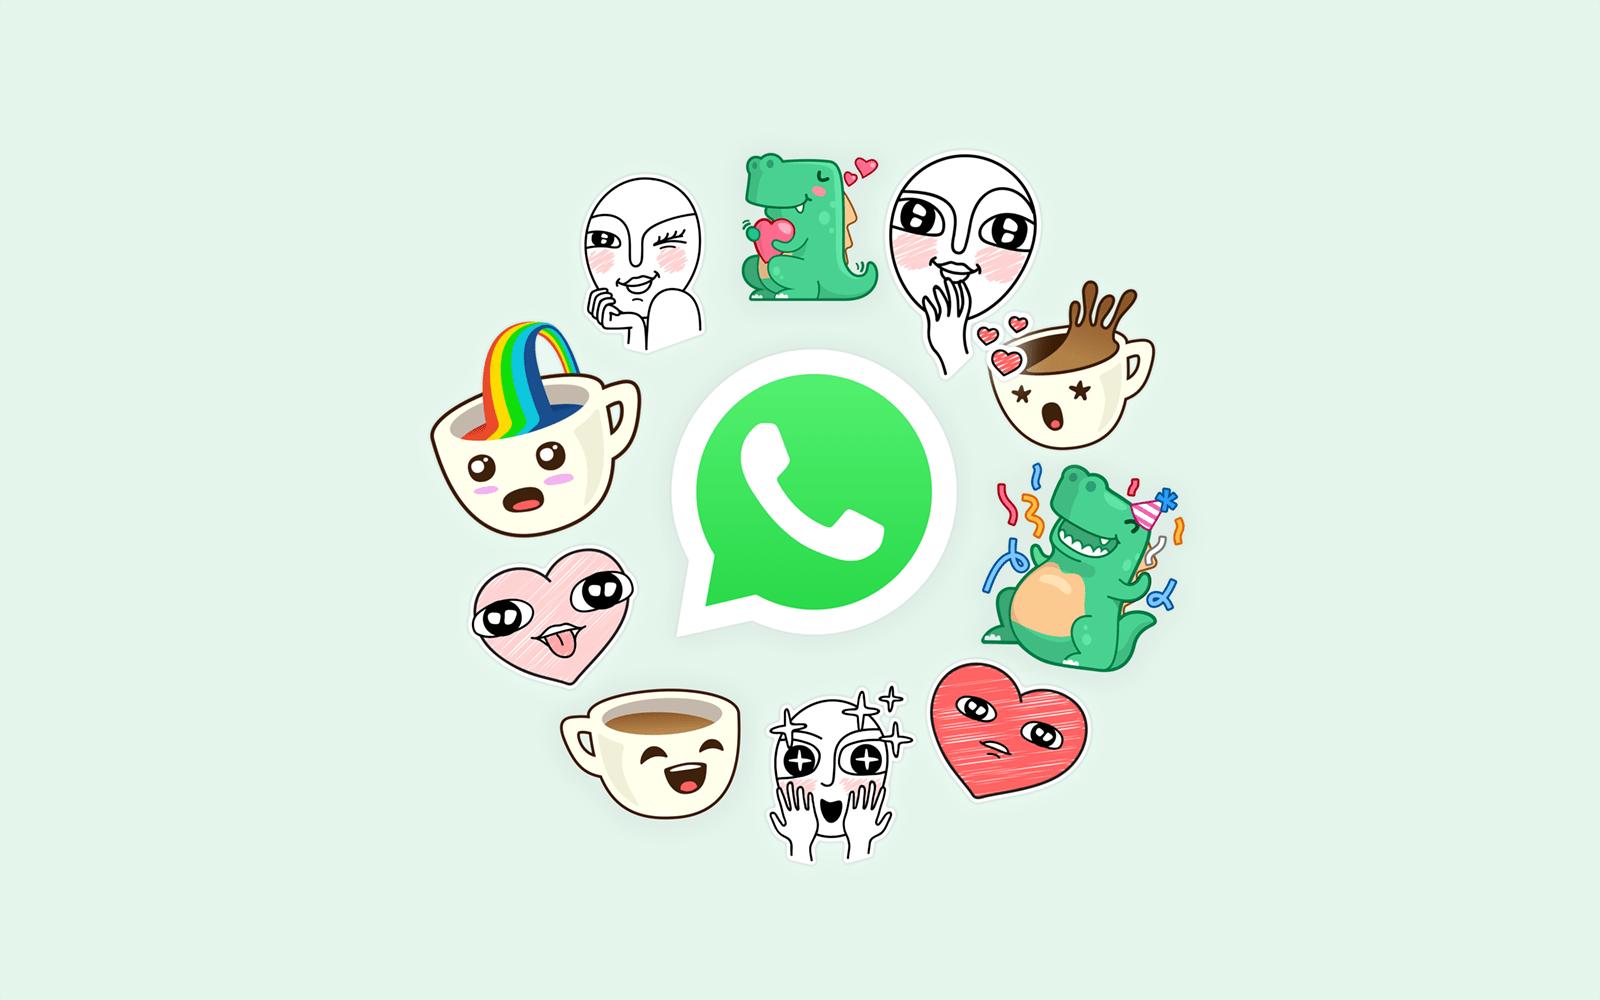 whatsapp-app-permite-agregar-stickers-chats